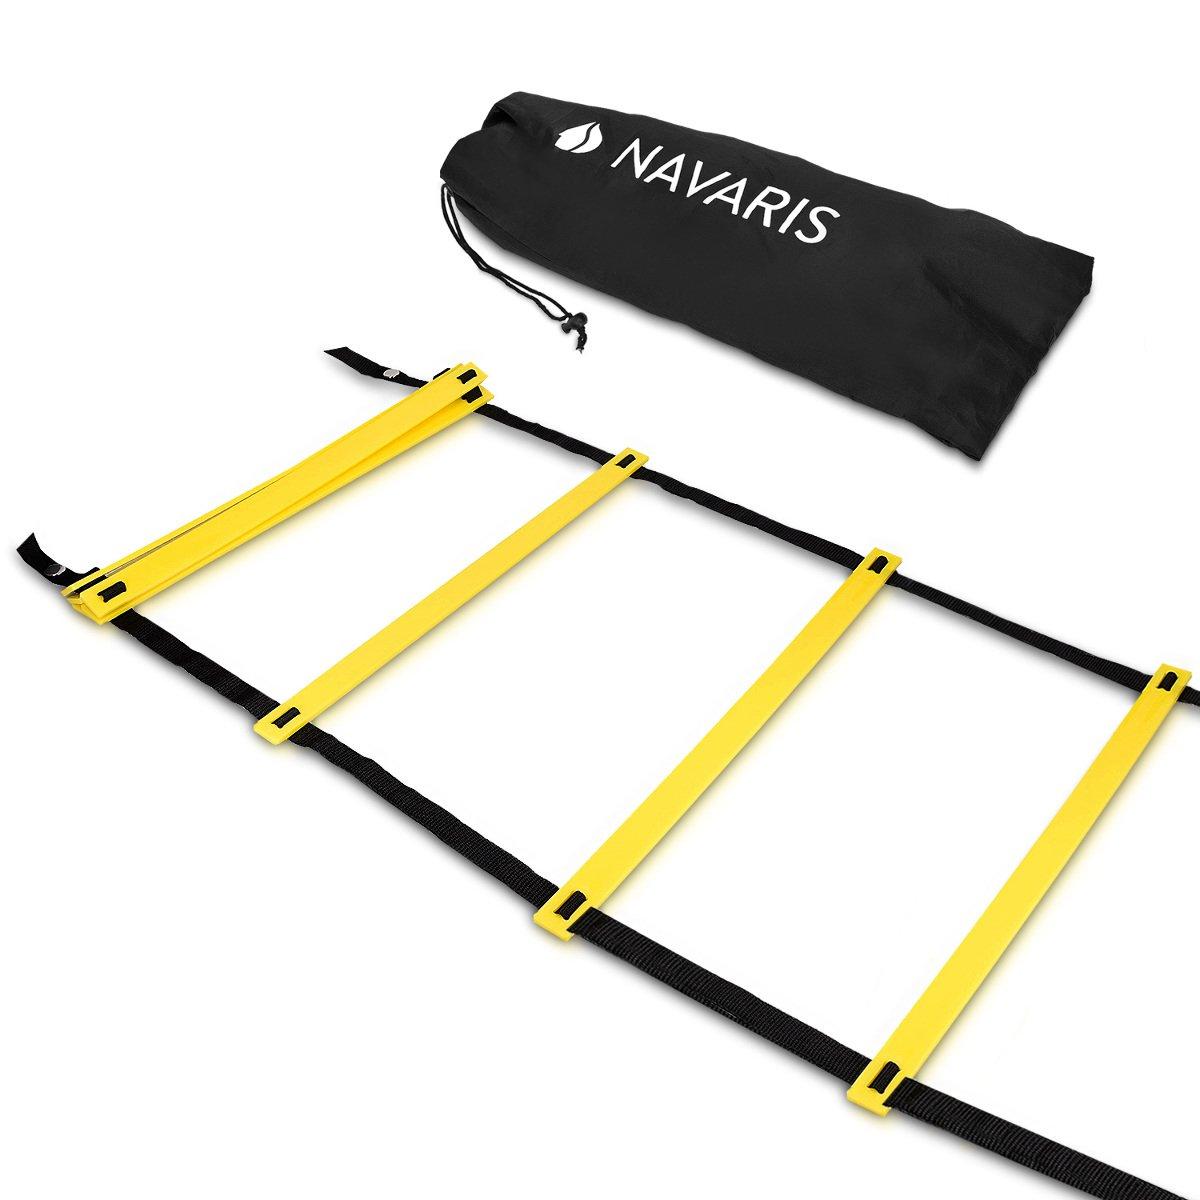 Navaris coordination ladder 6m workout agility ladder - basketball football soccer speed ladder - training ladder speed training 1 bag